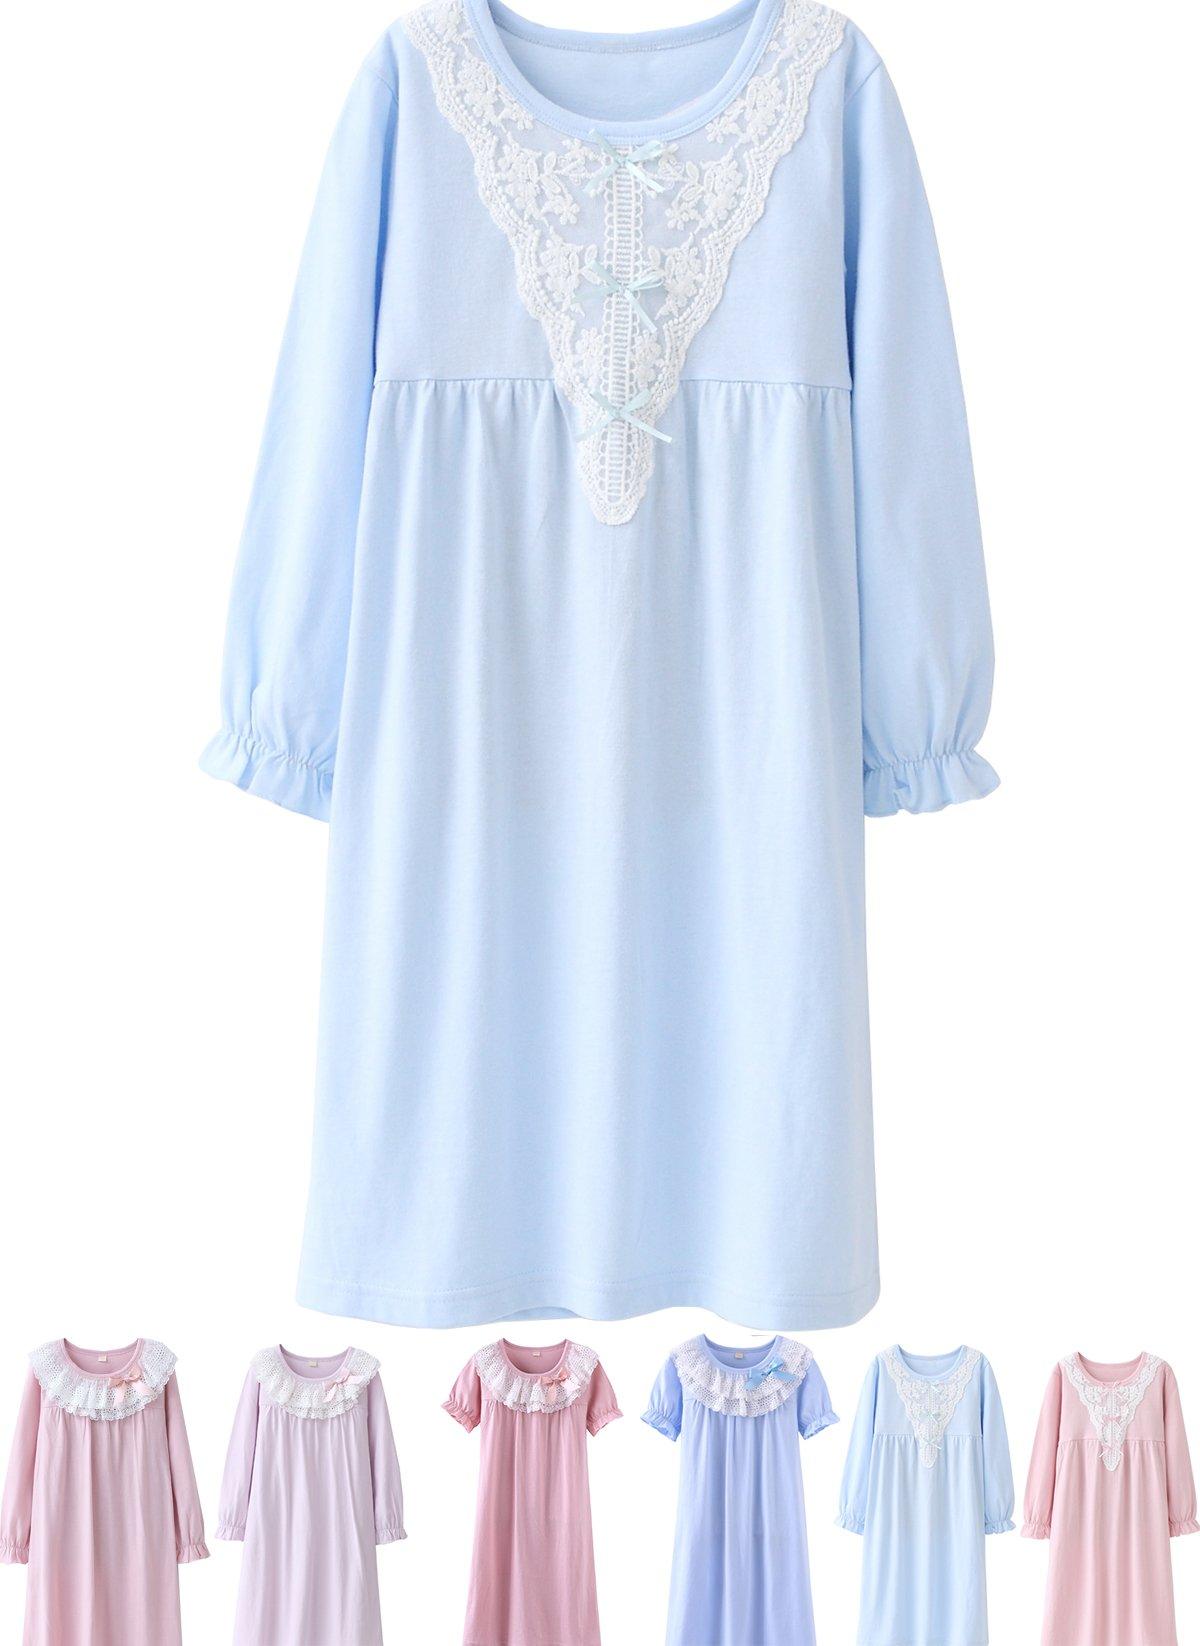 Abalaco Girls Kids Princess Lace Bowknot Nightgown Long Sleeve Cotton Sleepwear Dress Pretty V-neck Like Loose Homewear Dress 4-5 Years V/Blue